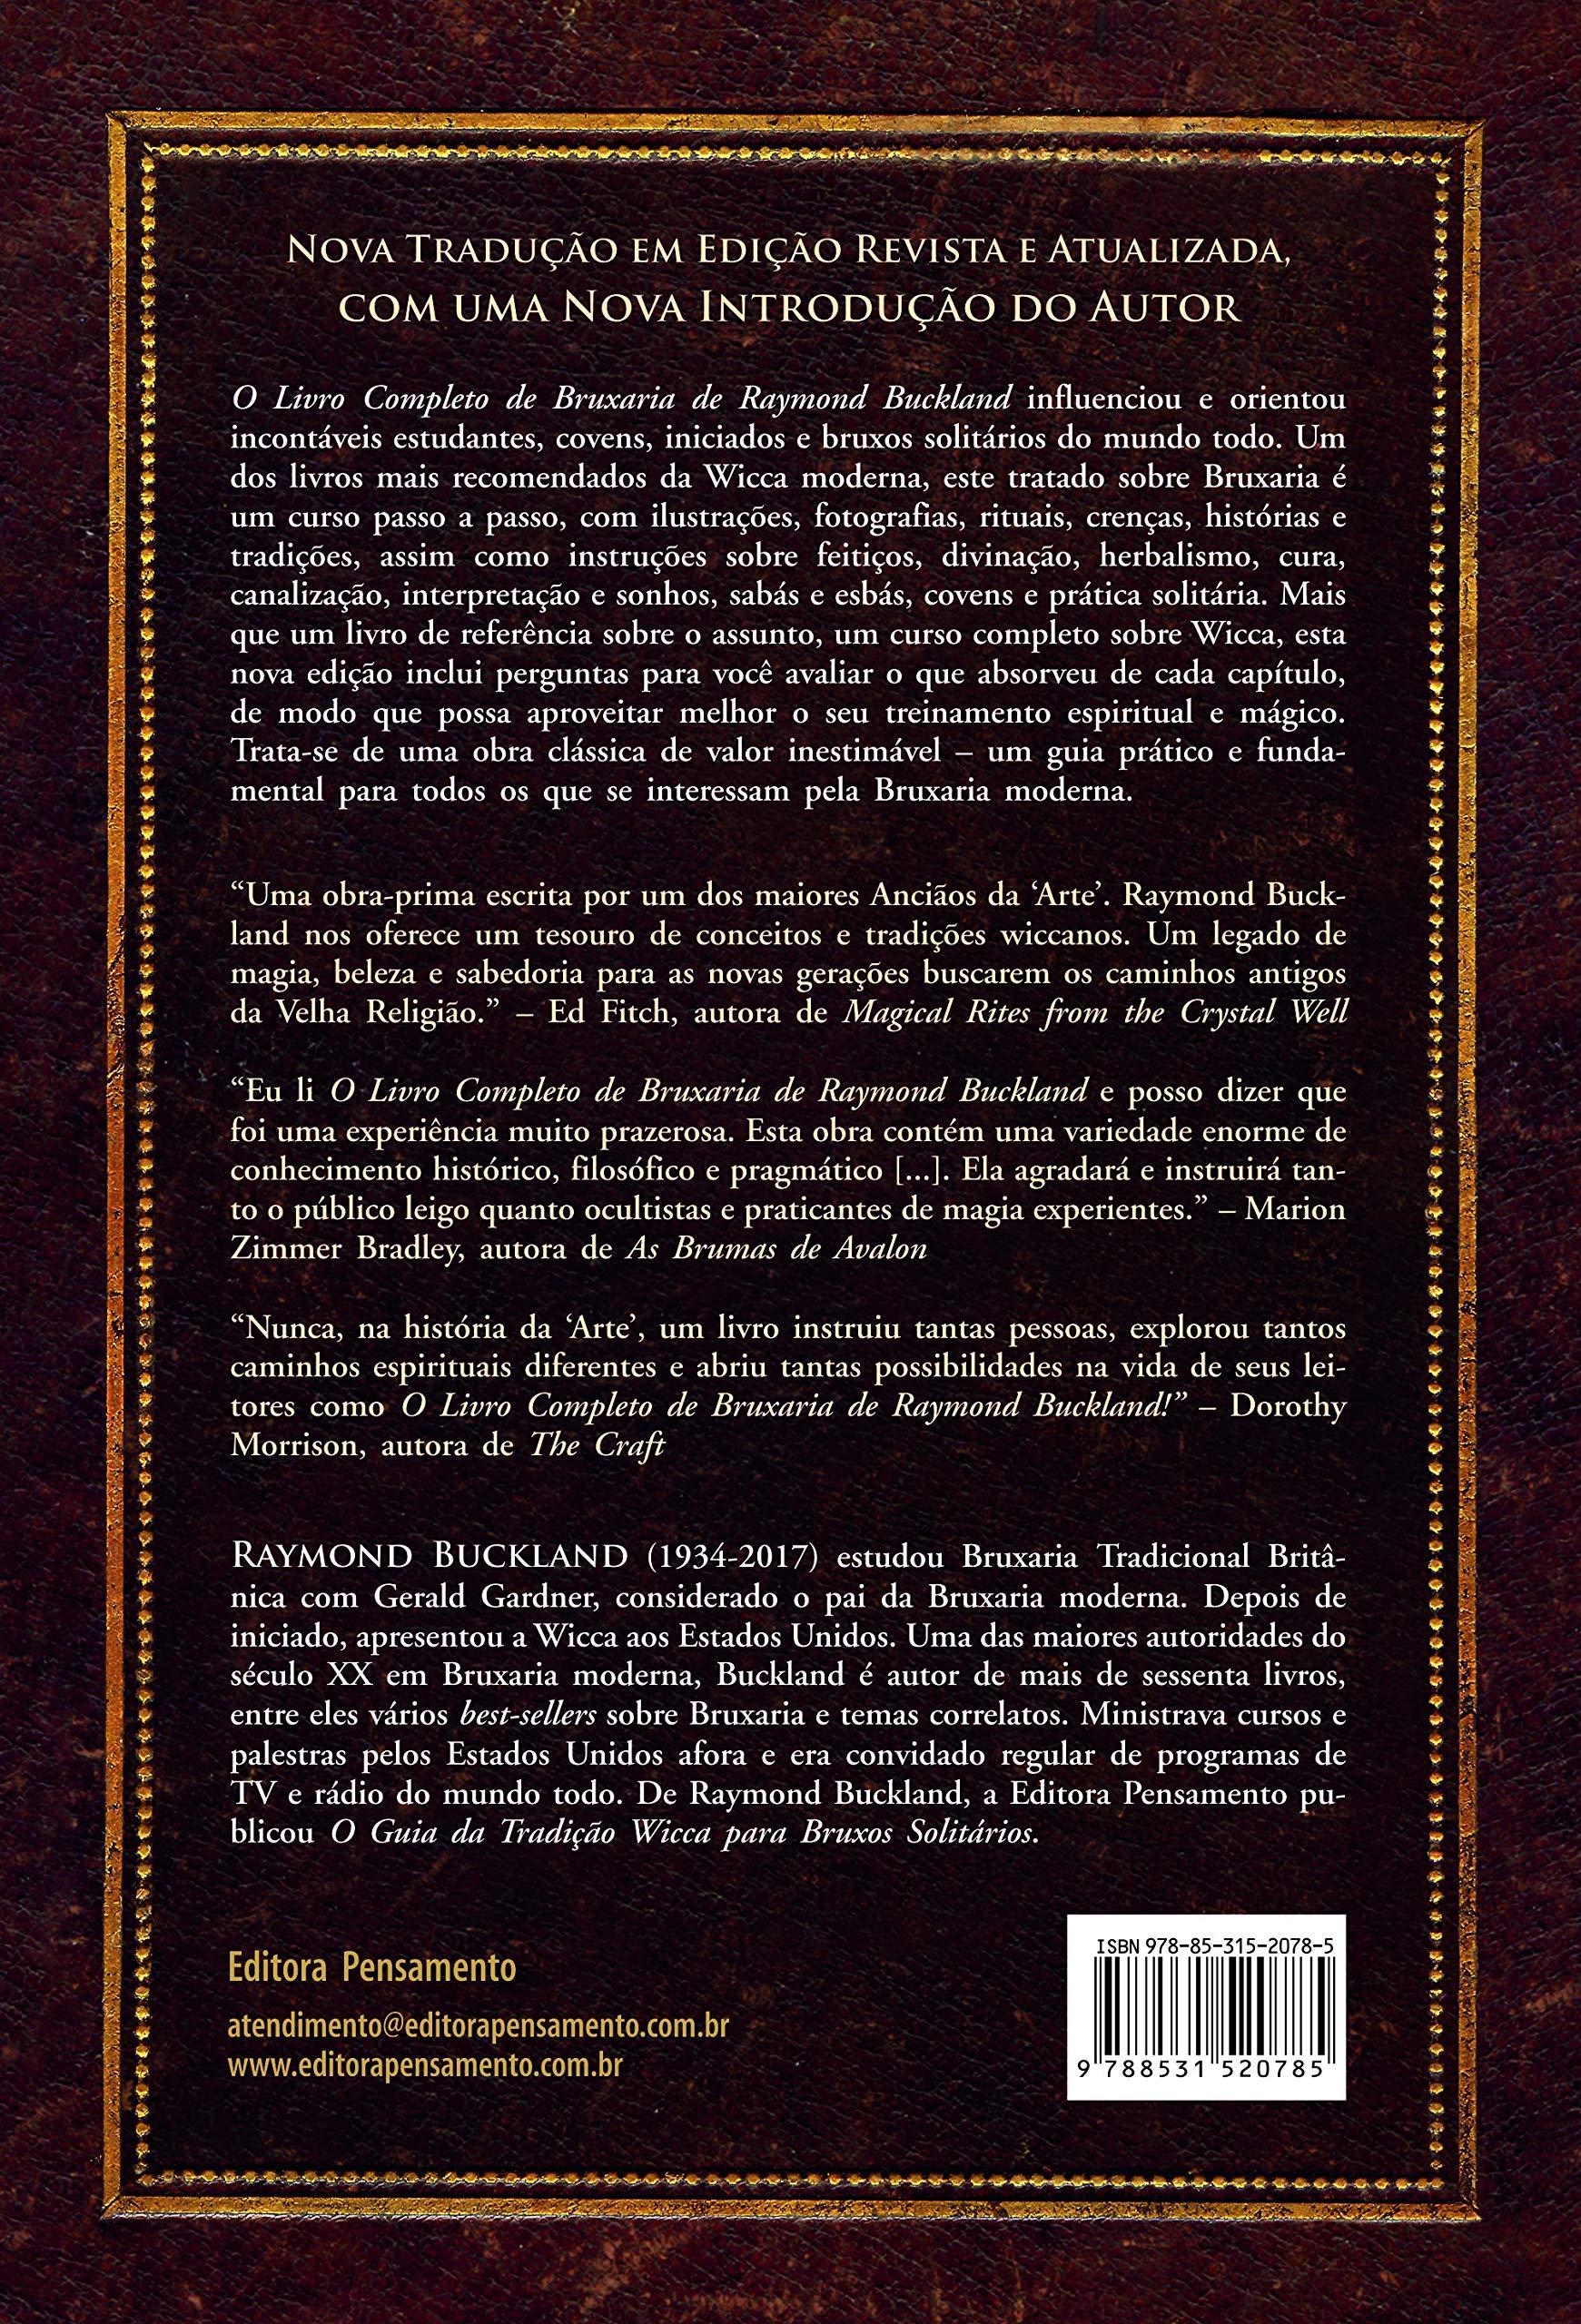 Livro 'O Livro Completo de Bruxaria de Raymon Buckland' por Raymond Buckland